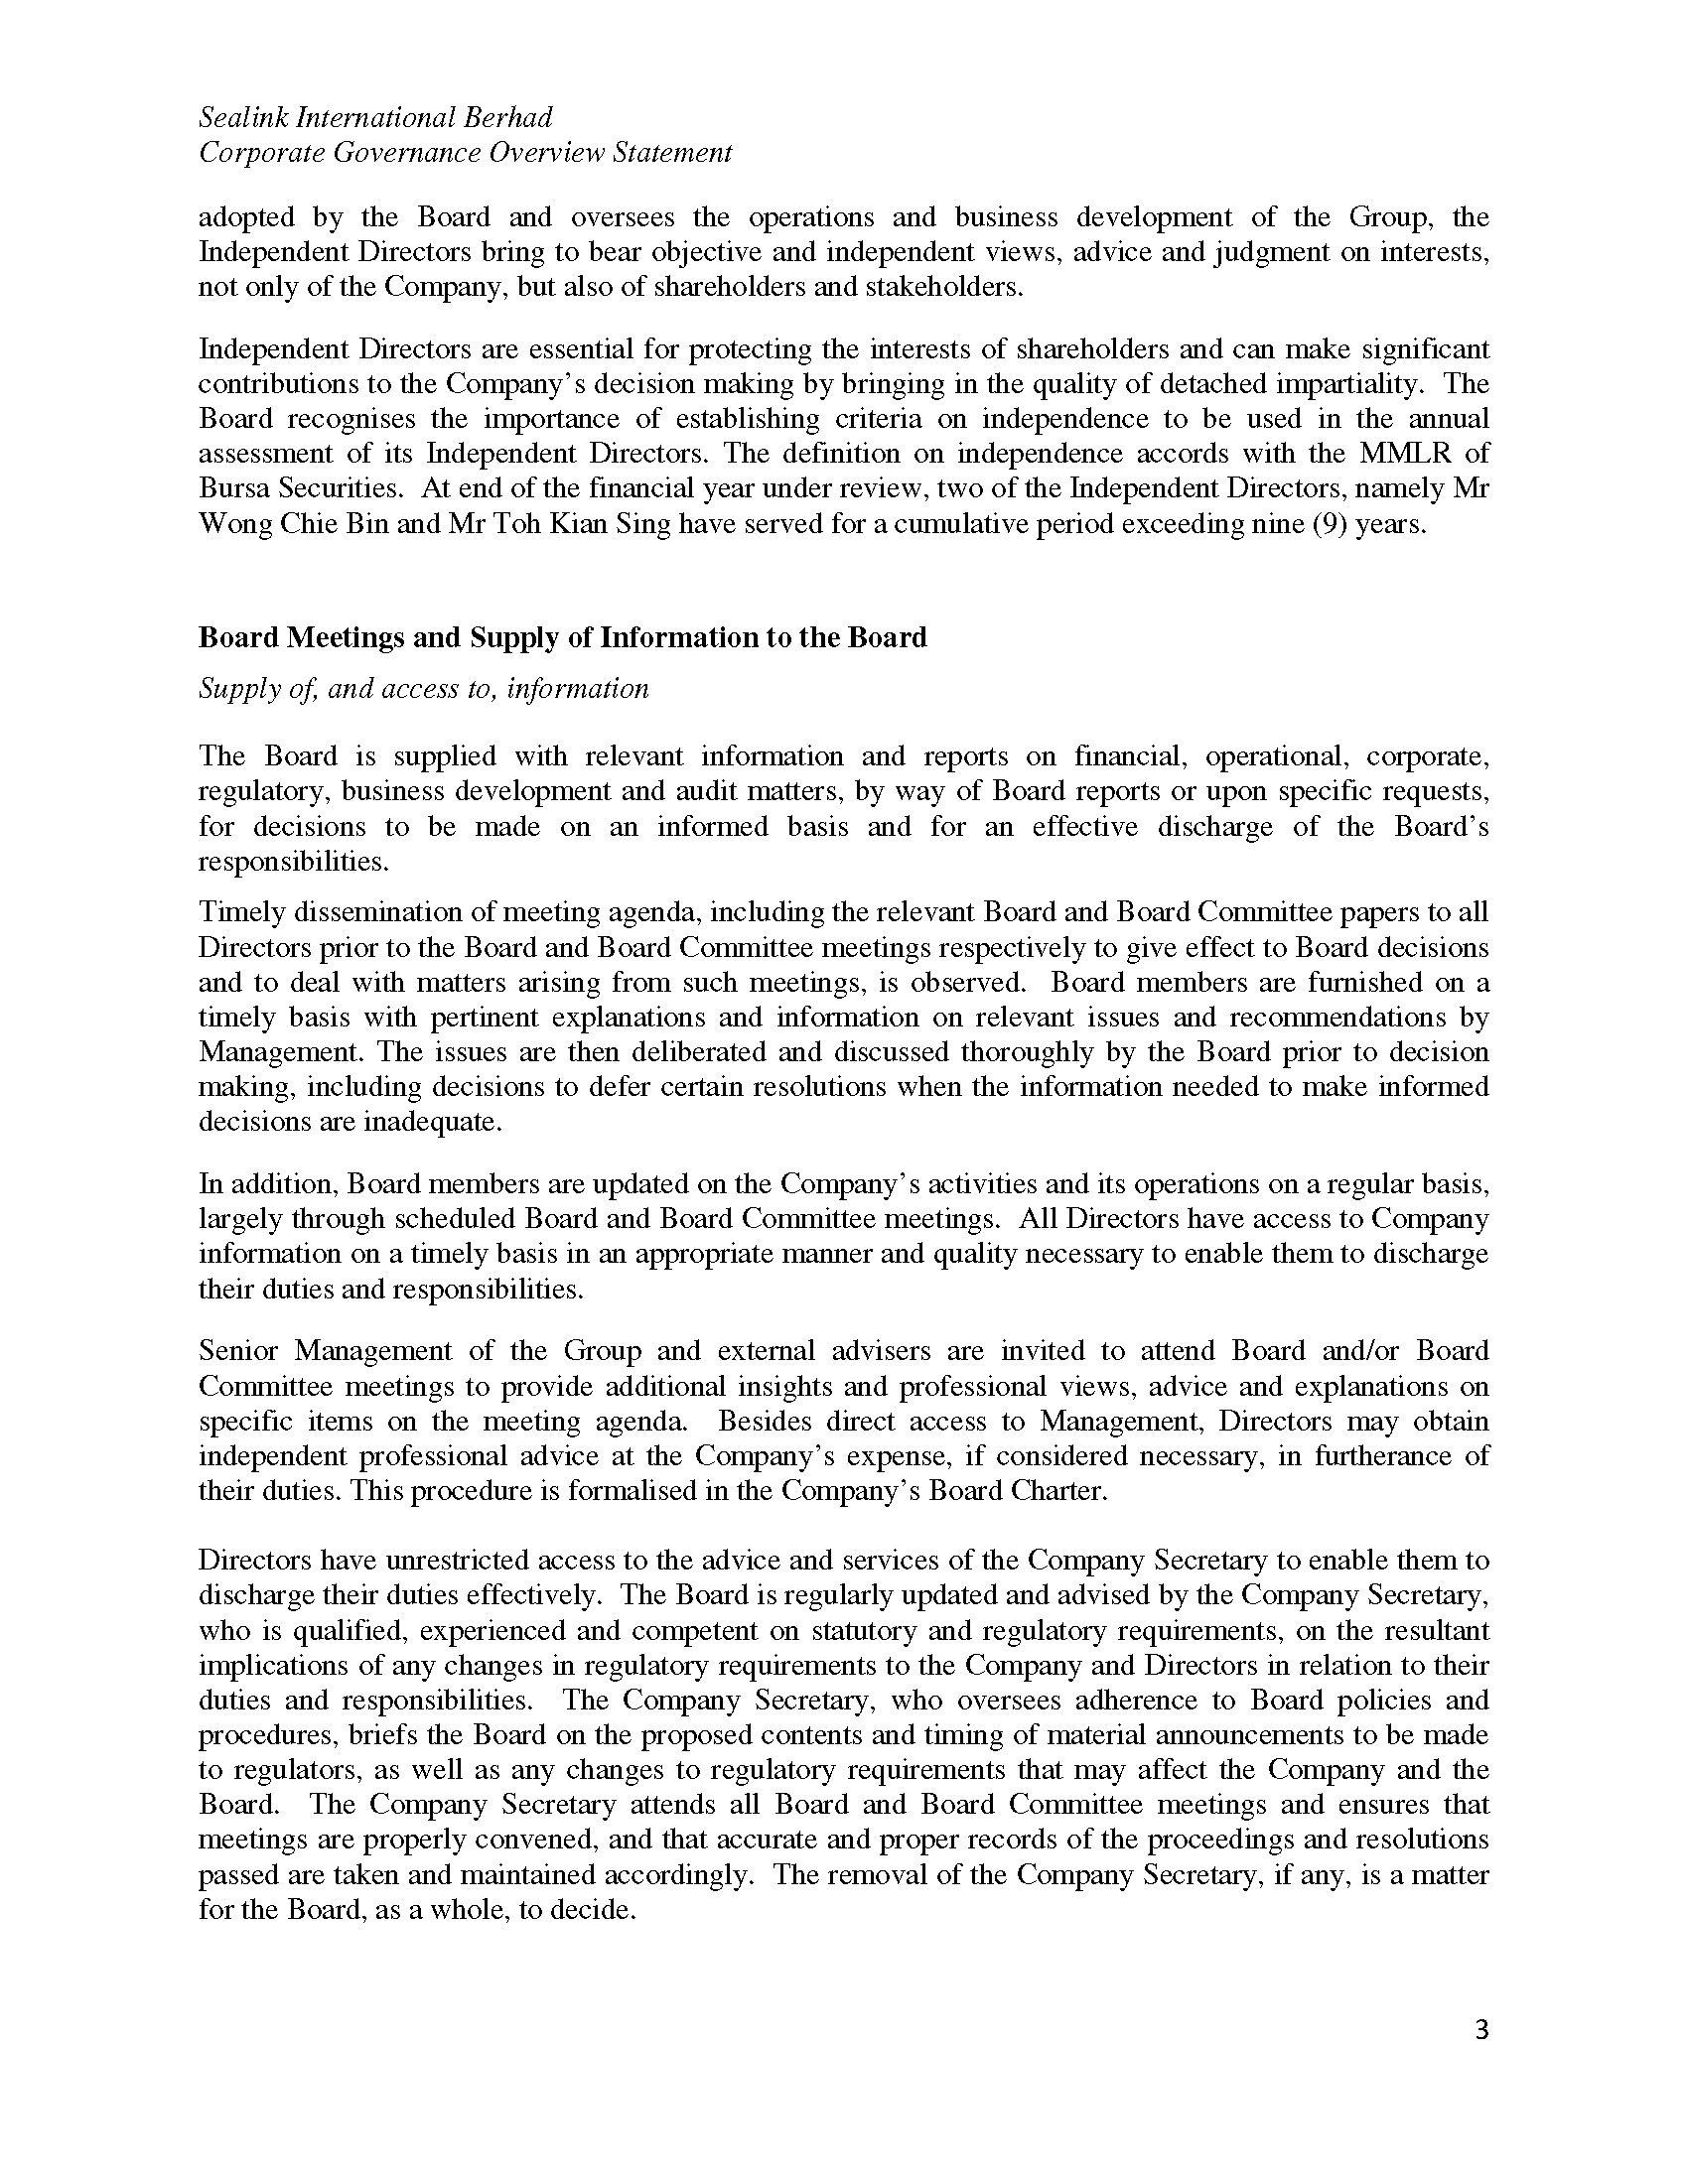 Corporate Governance of Sealink International Berhad